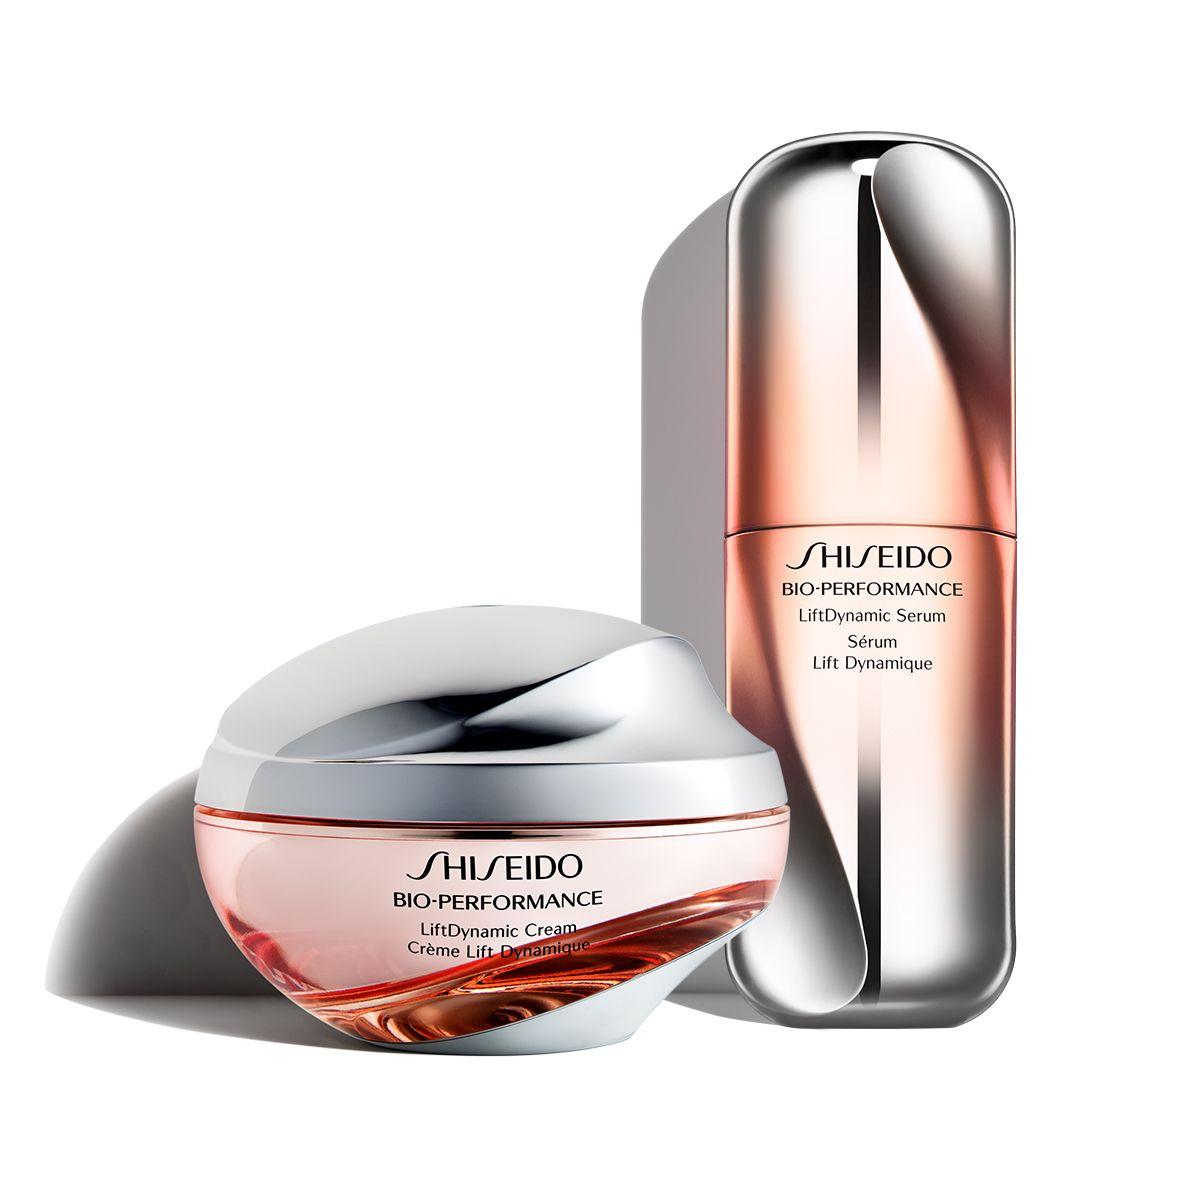 Shiseido Bio Performance Liftdynamic Cream